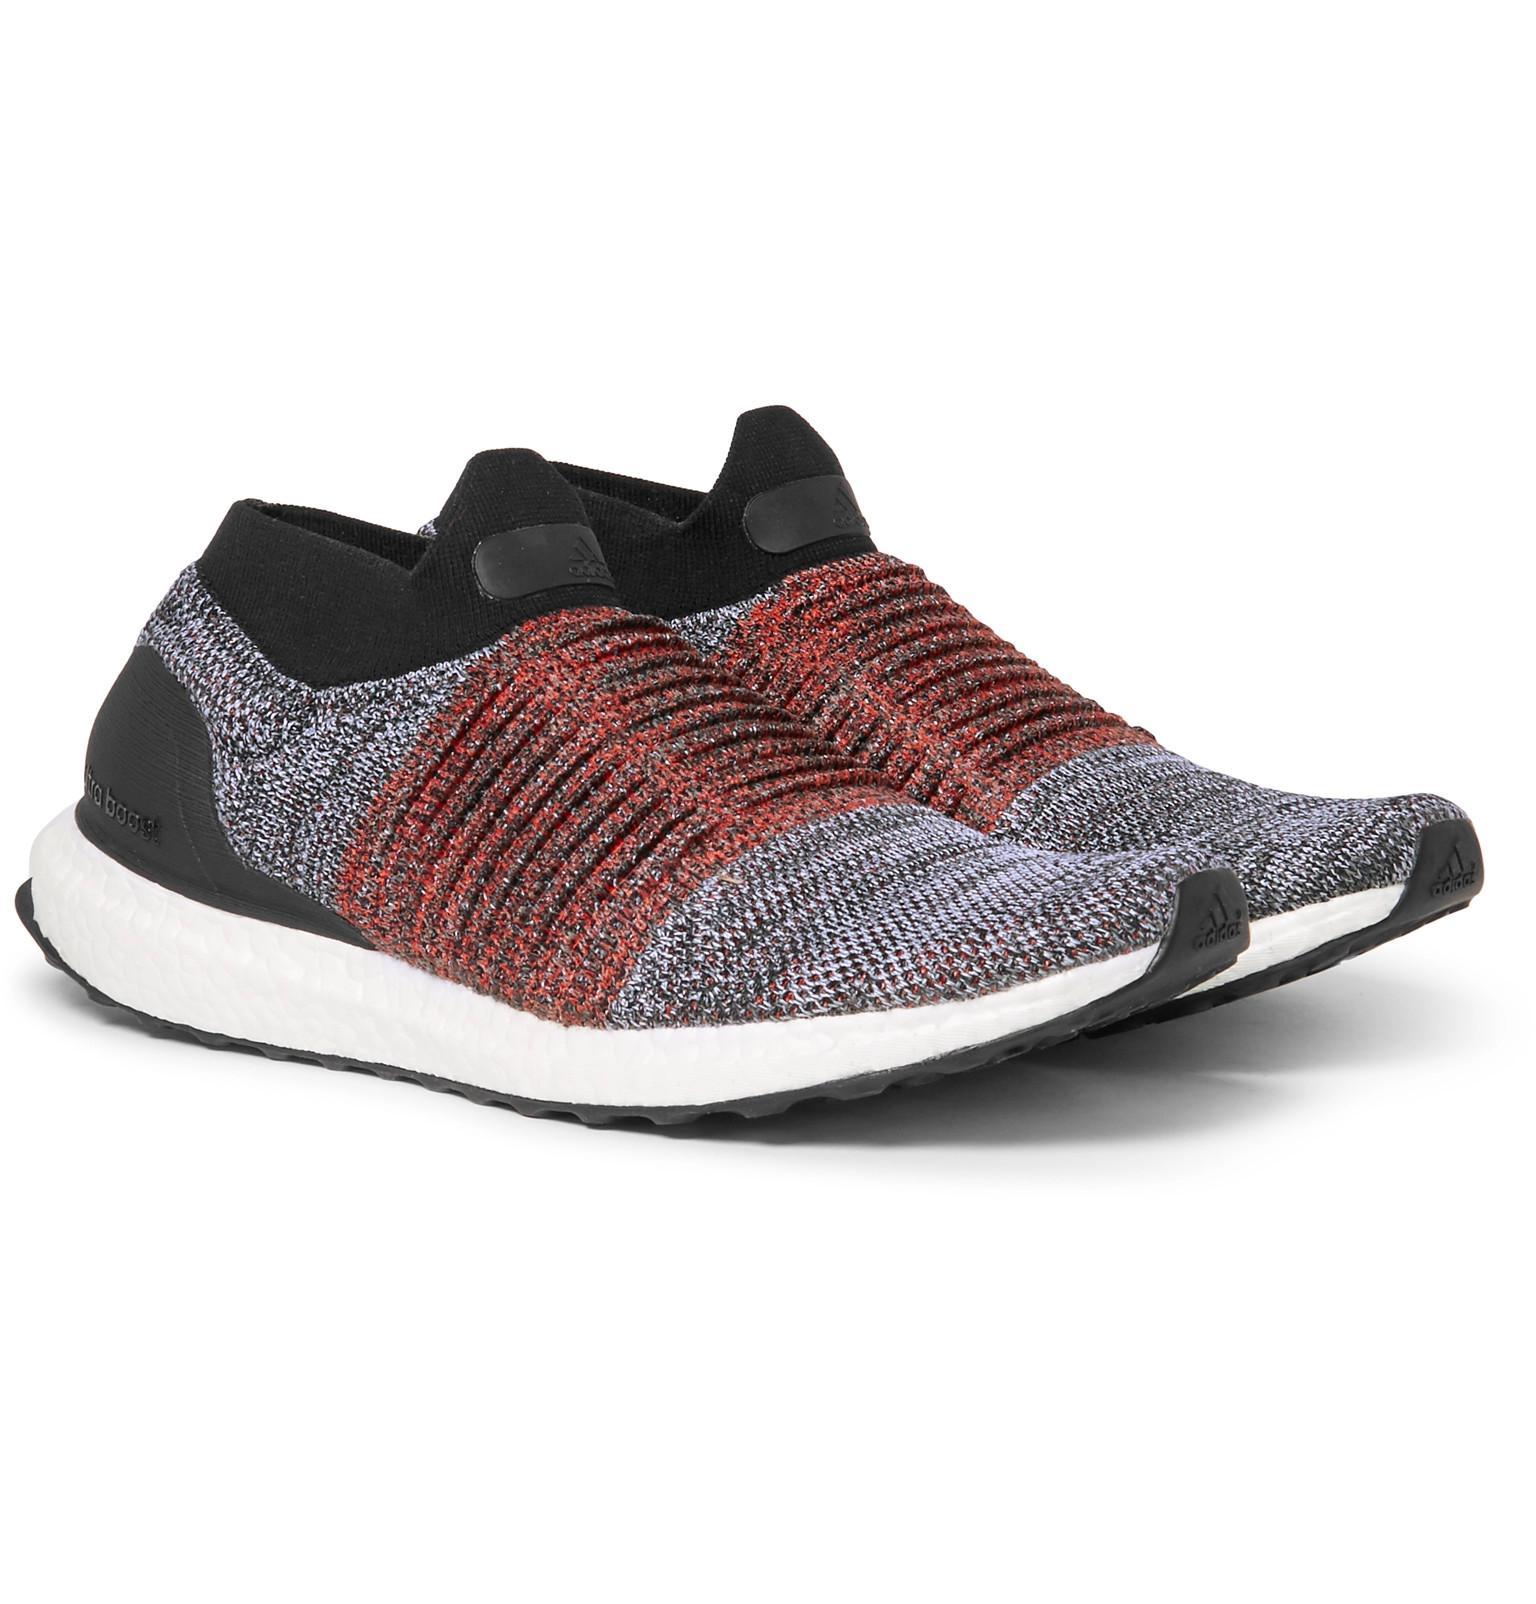 Adidas Originals ultra impulso primeknit zapatilla en negro para hombres Lyst